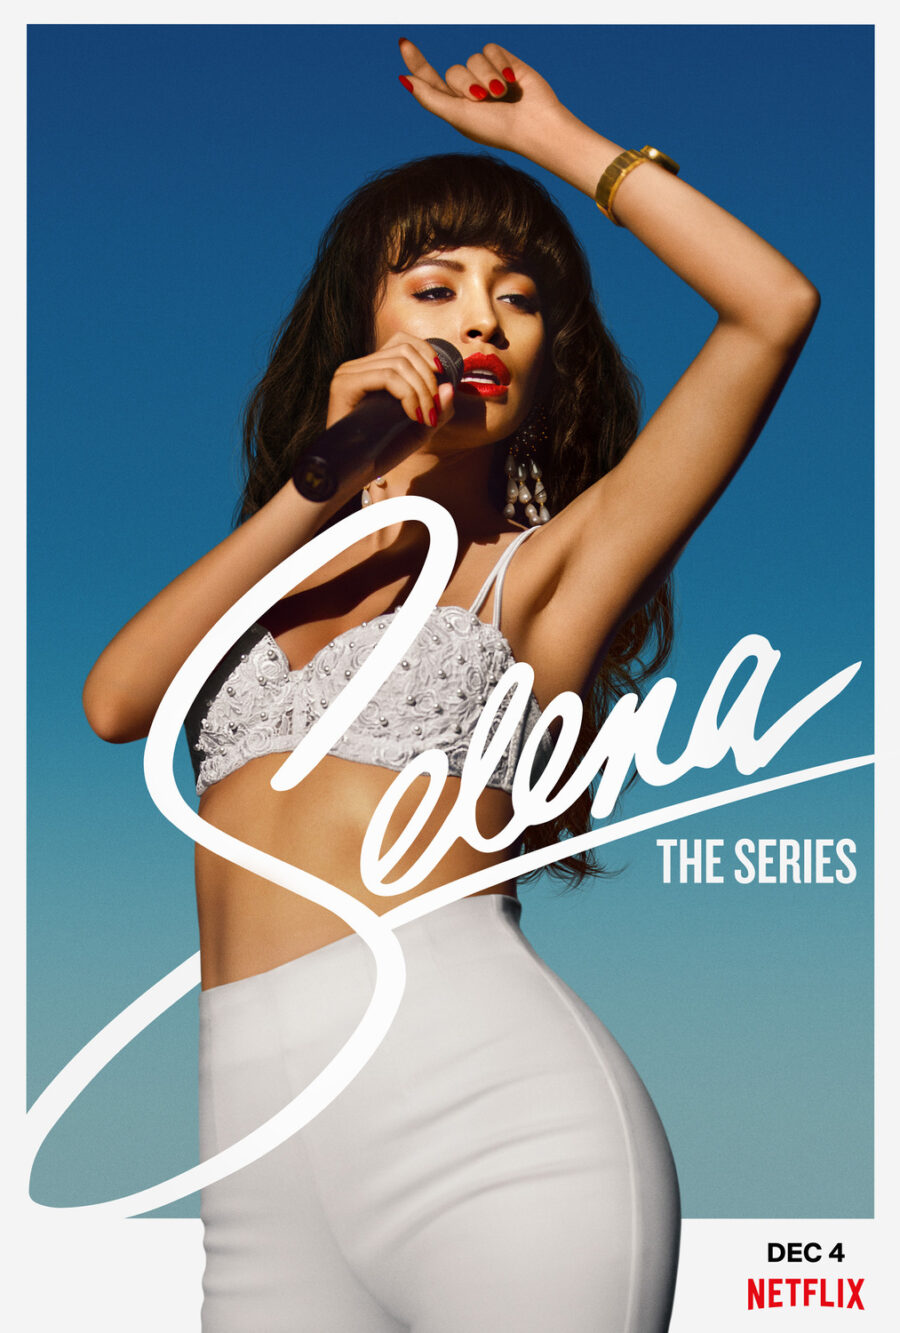 Christian Serratos as Selena